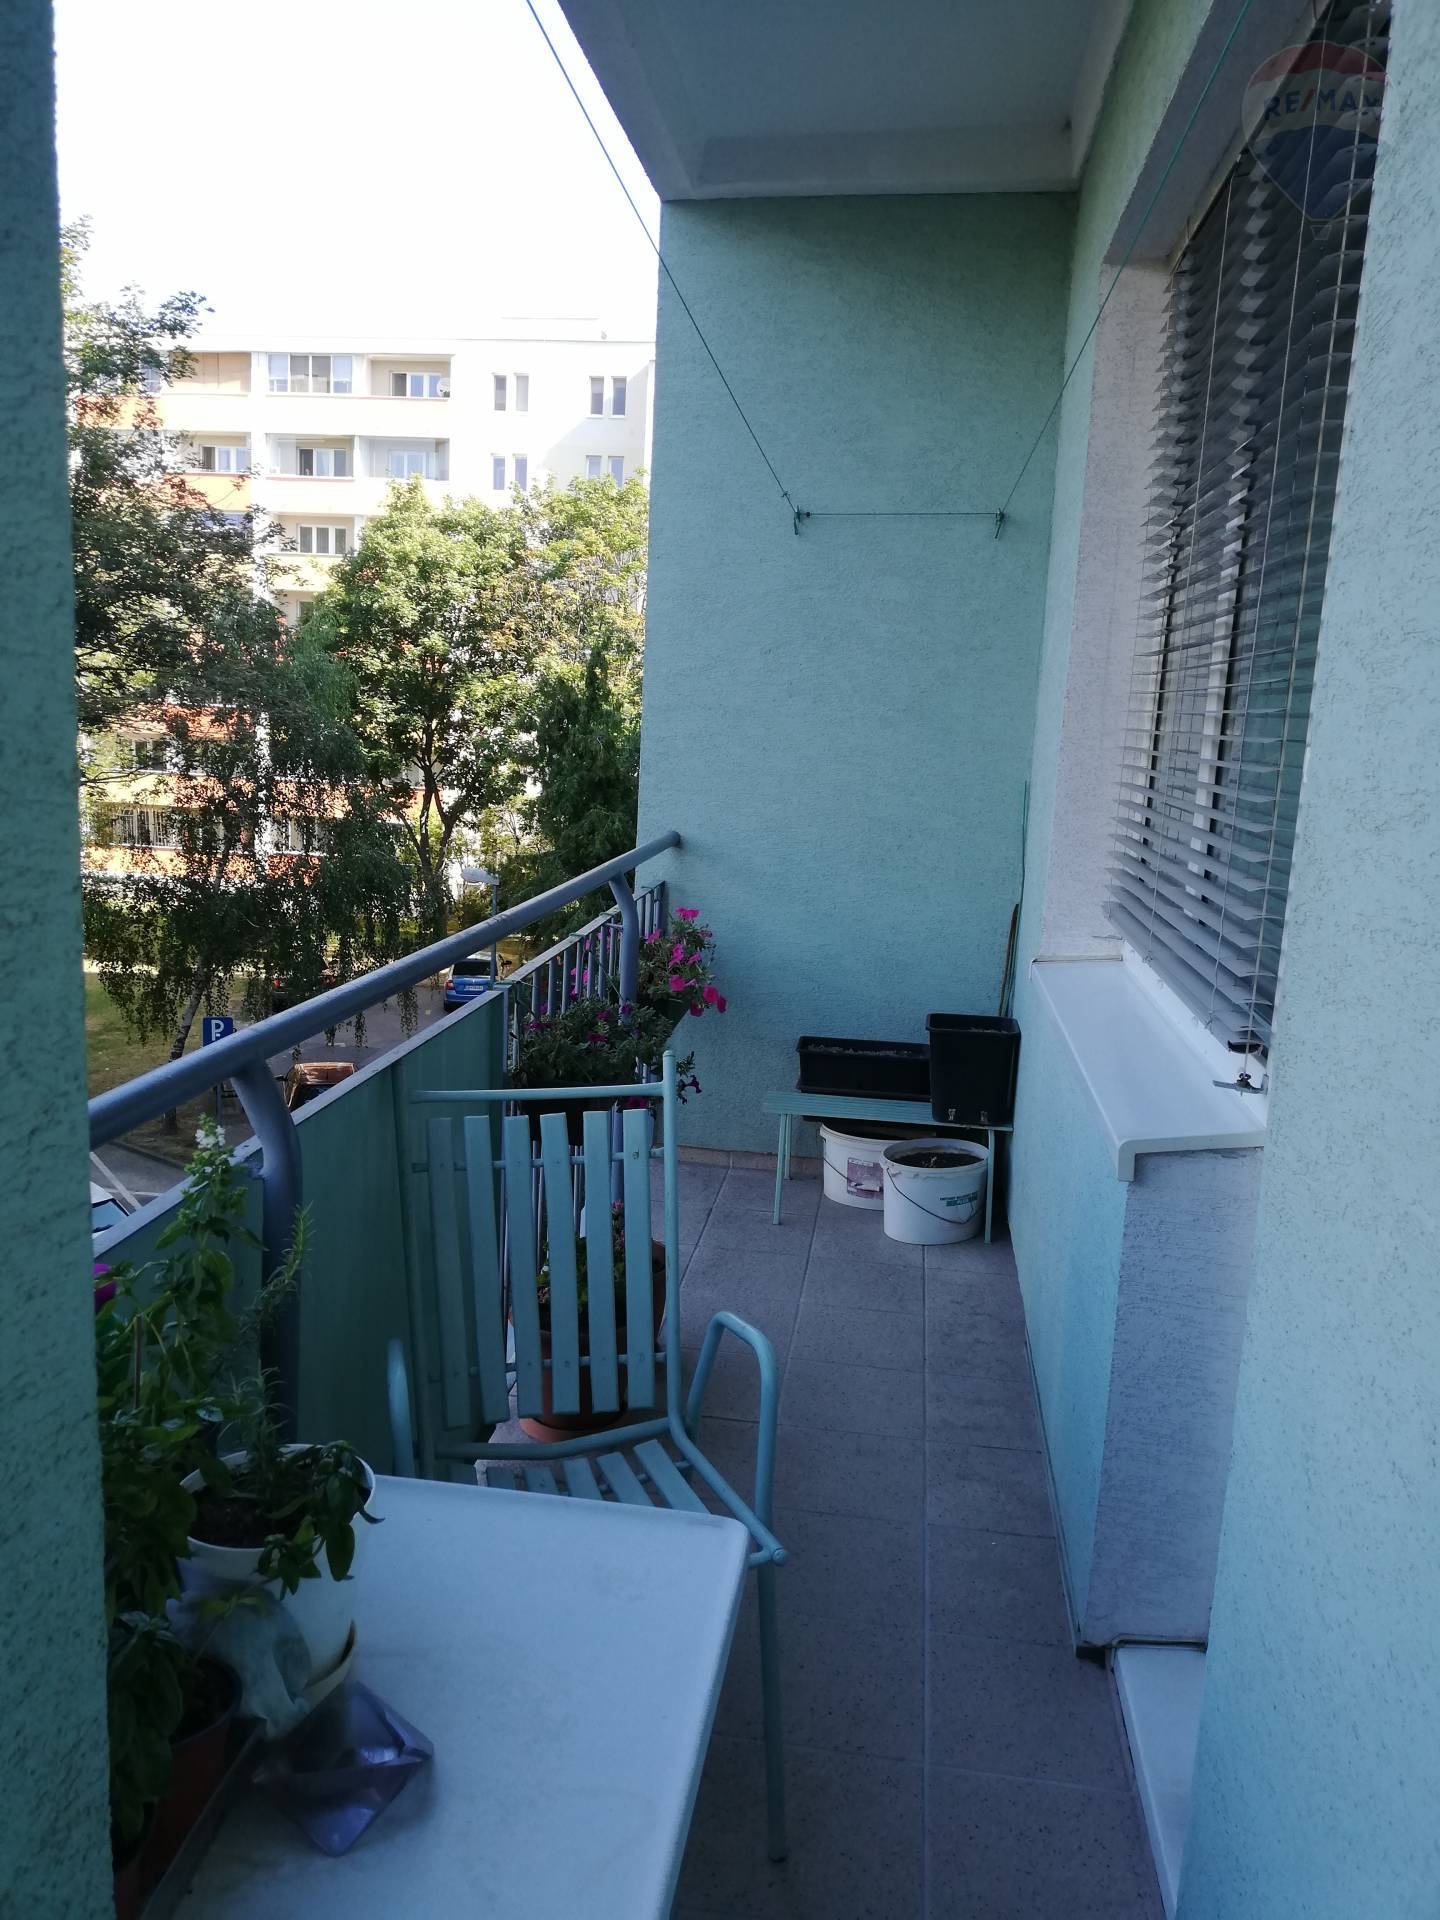 Predaj bytu (3 izbový) 75 m2, Bratislava - Ružinov - 3izbový byt balkon